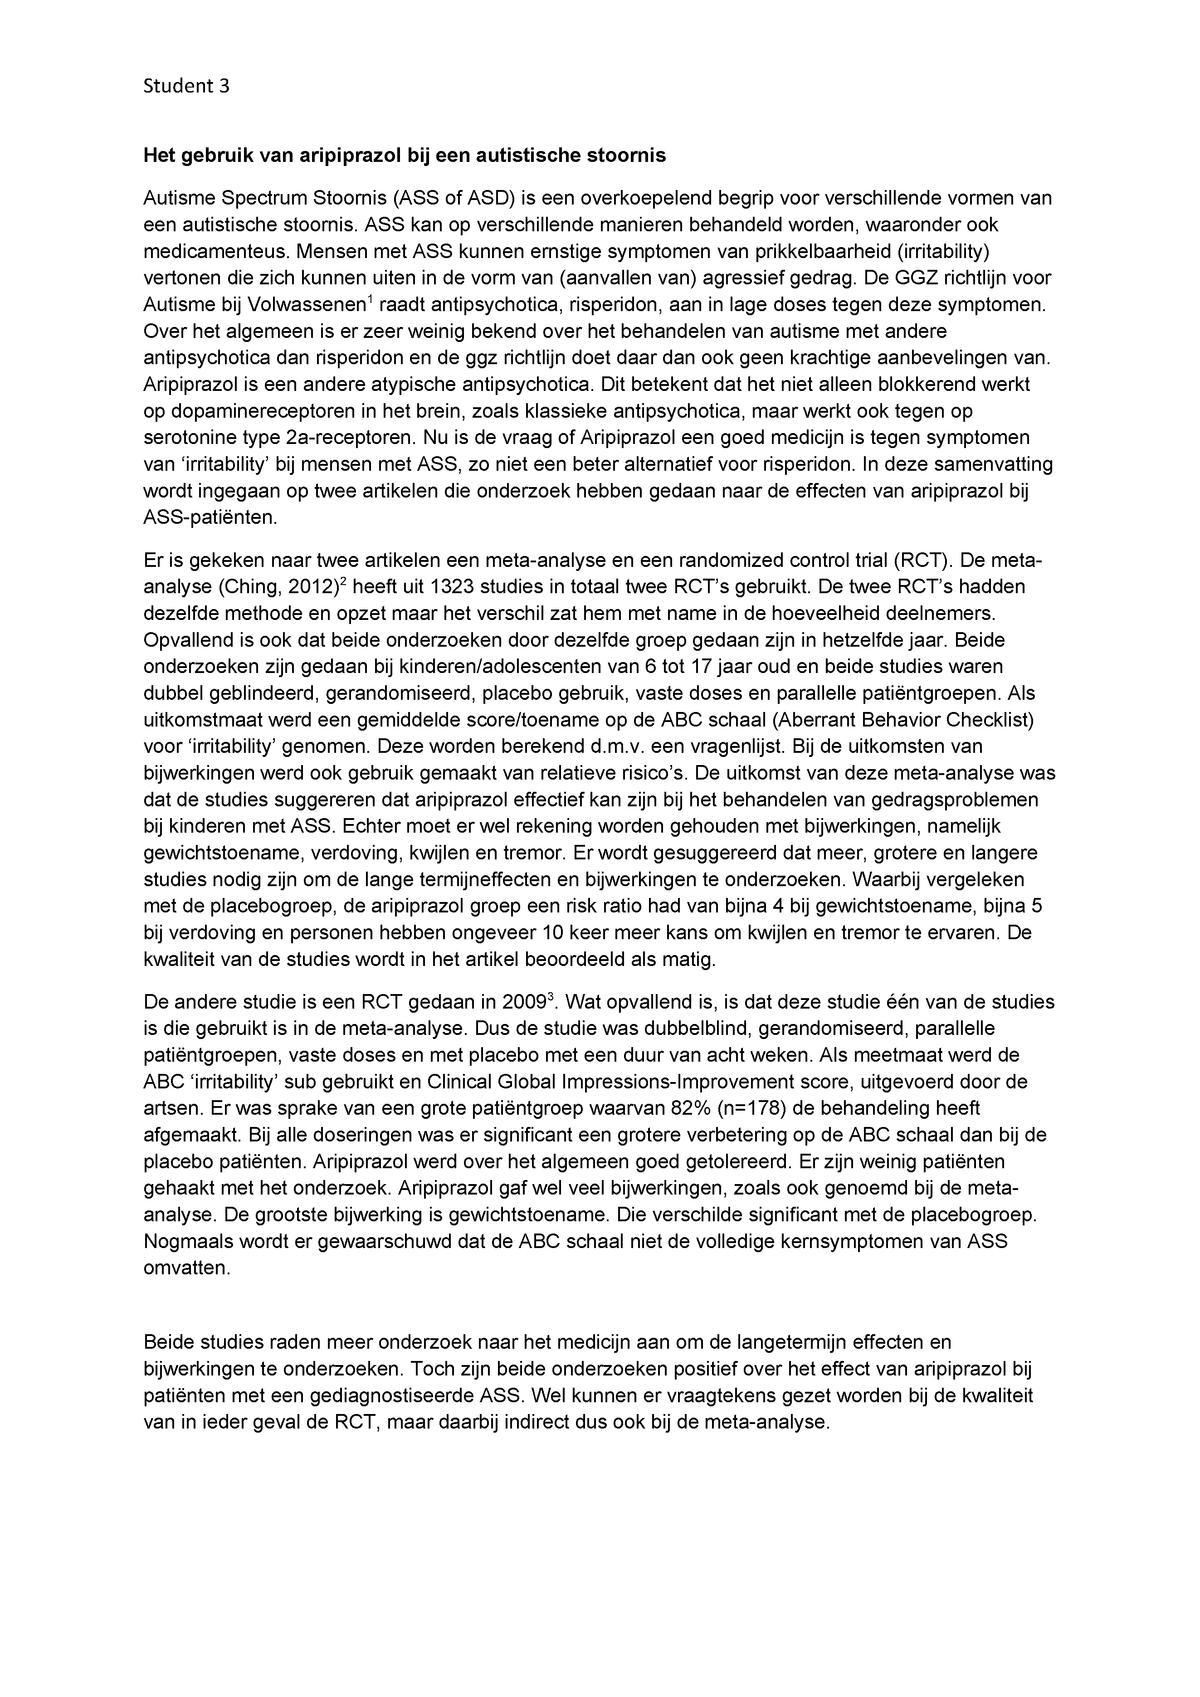 research paper argumentative essays